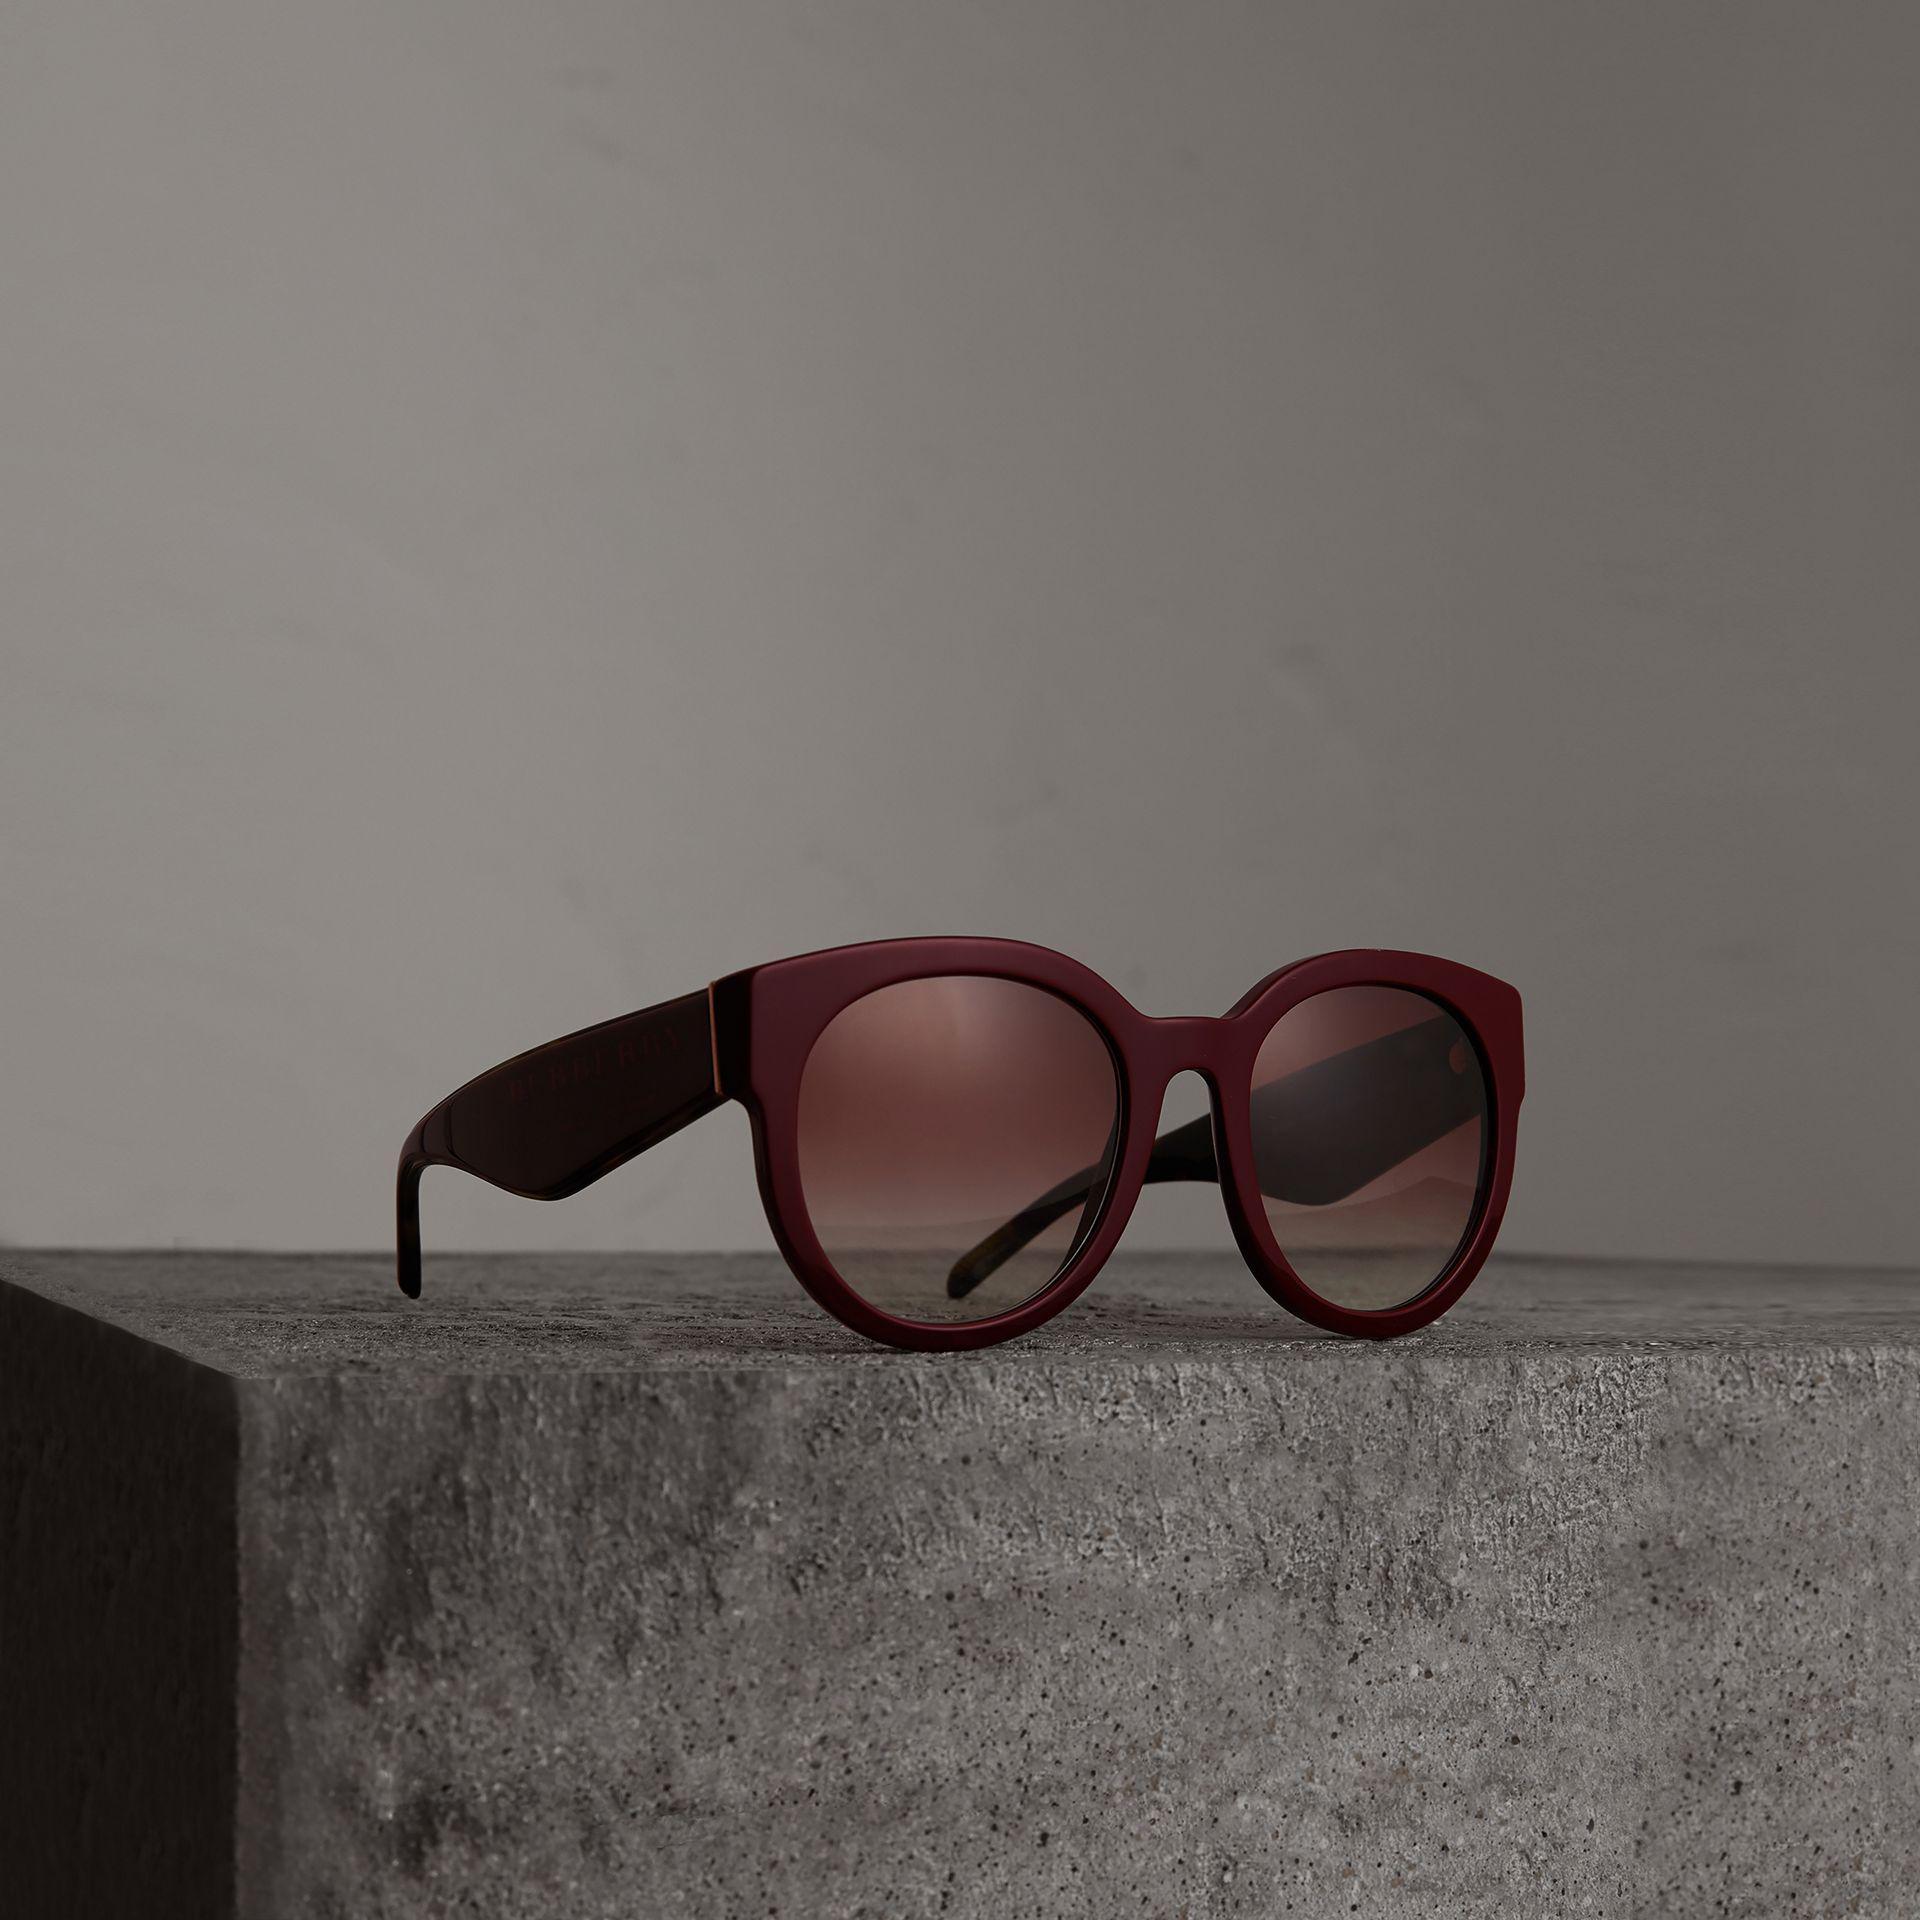 40deb83a5234 Lyst - Burberry Round Frame Sunglasses